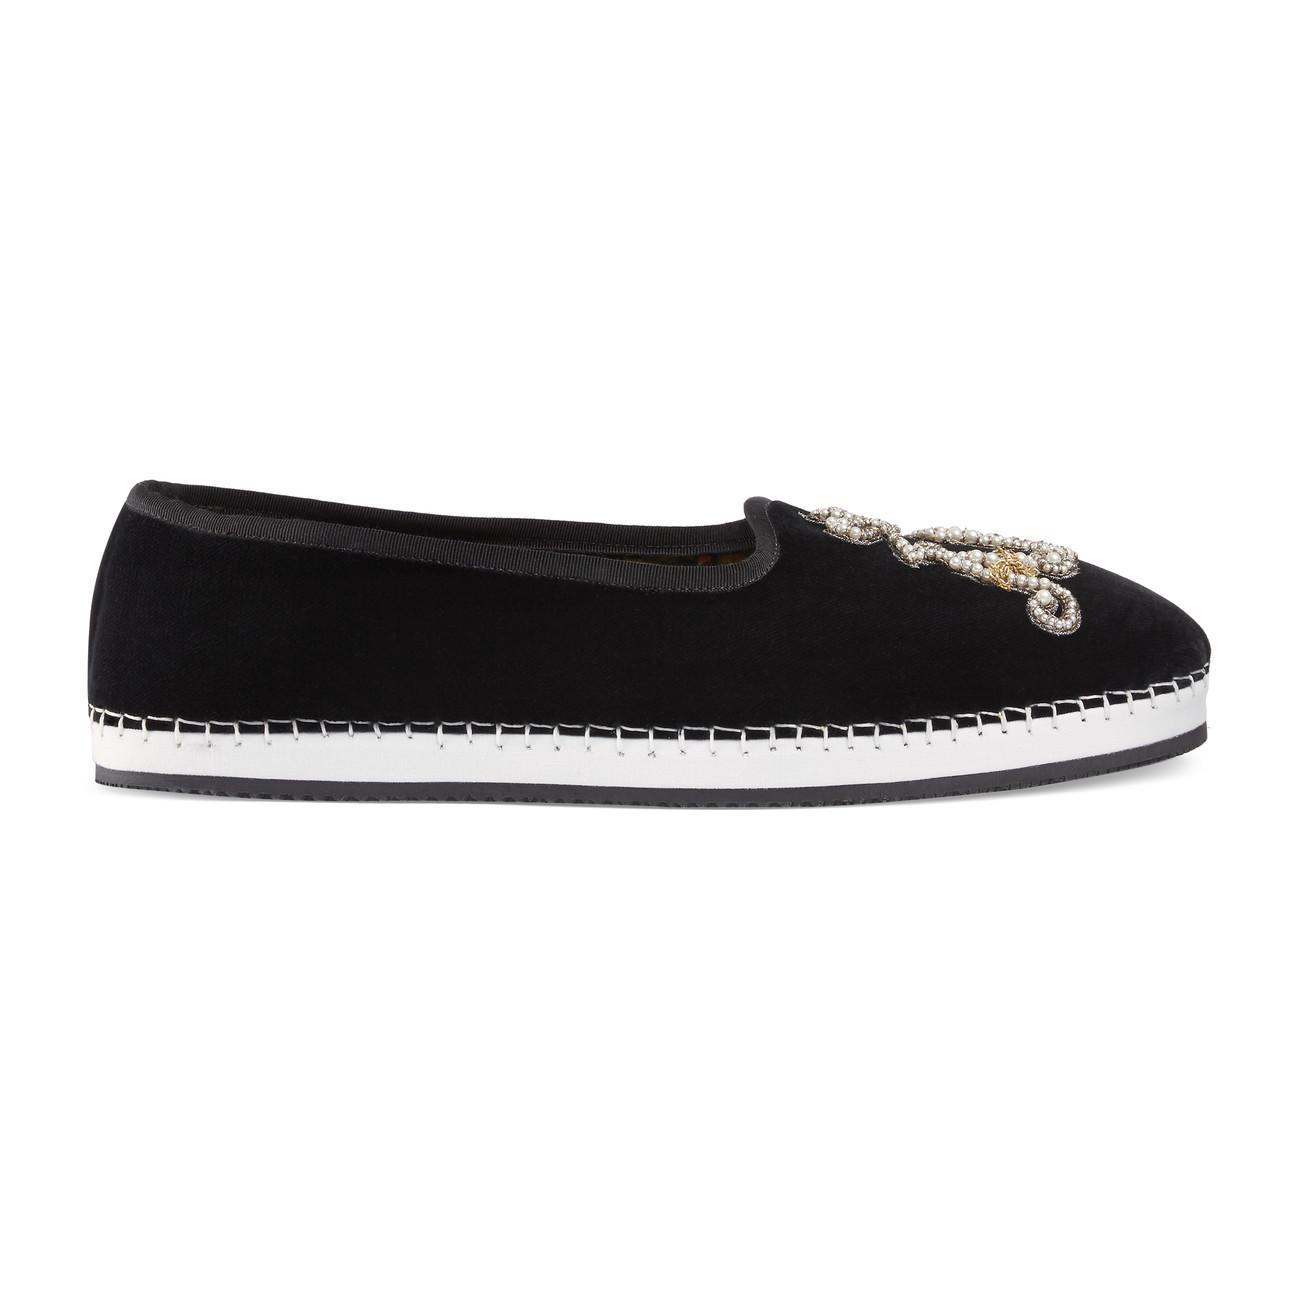 937e6065b Lyst - Gucci Men's Velvet Loafer With Am Appliqué in Black for Men